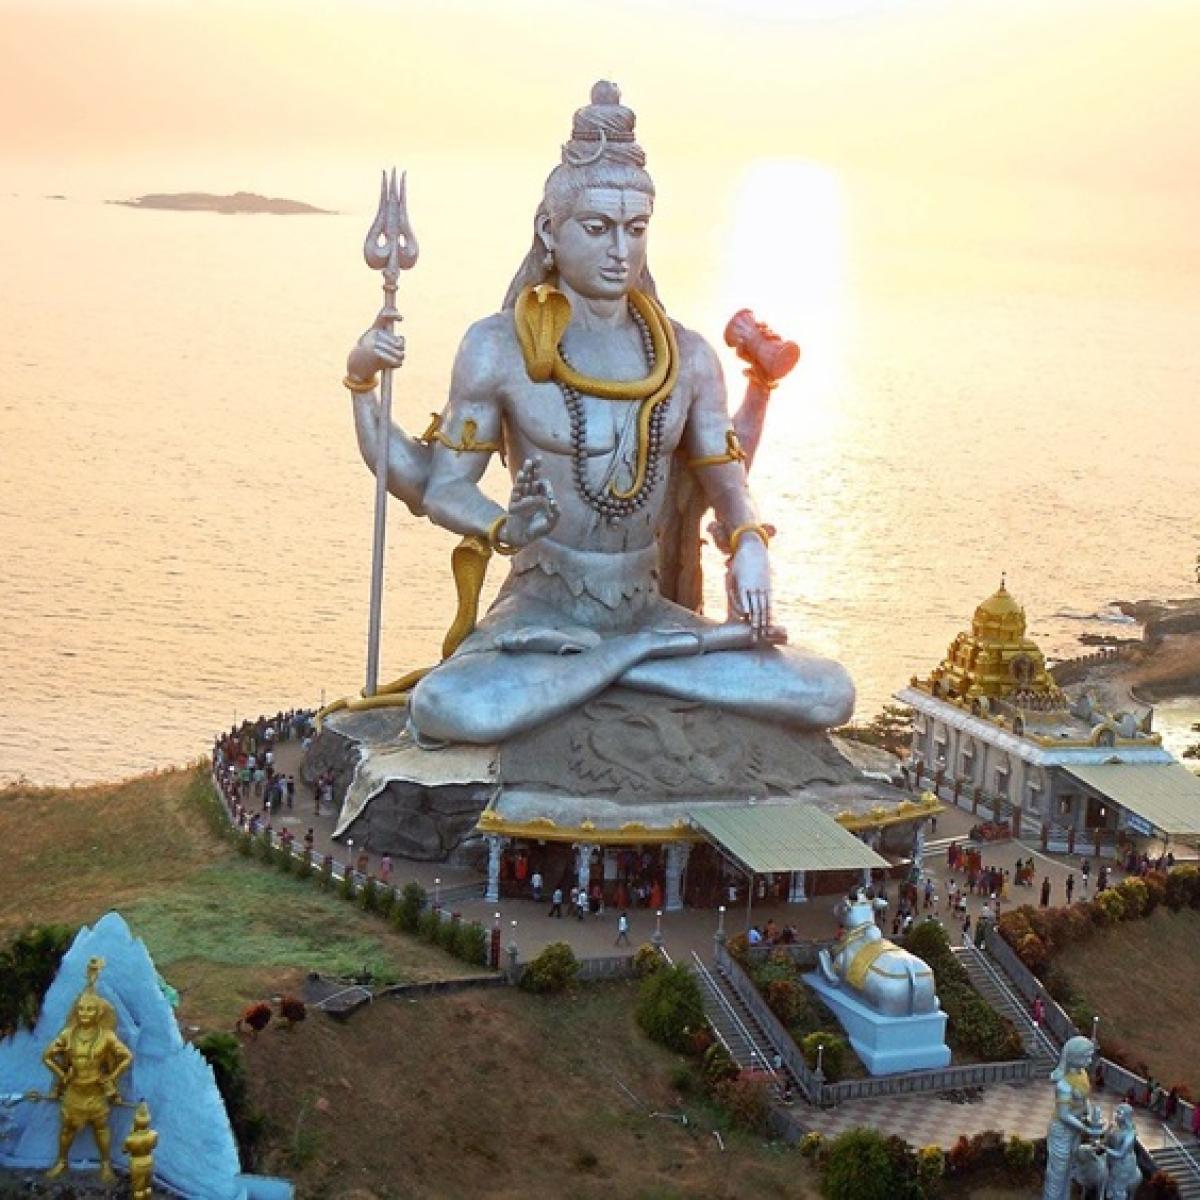 Maha Shivratri 2020: The real meaning of Shiv, Shankar and Shakti